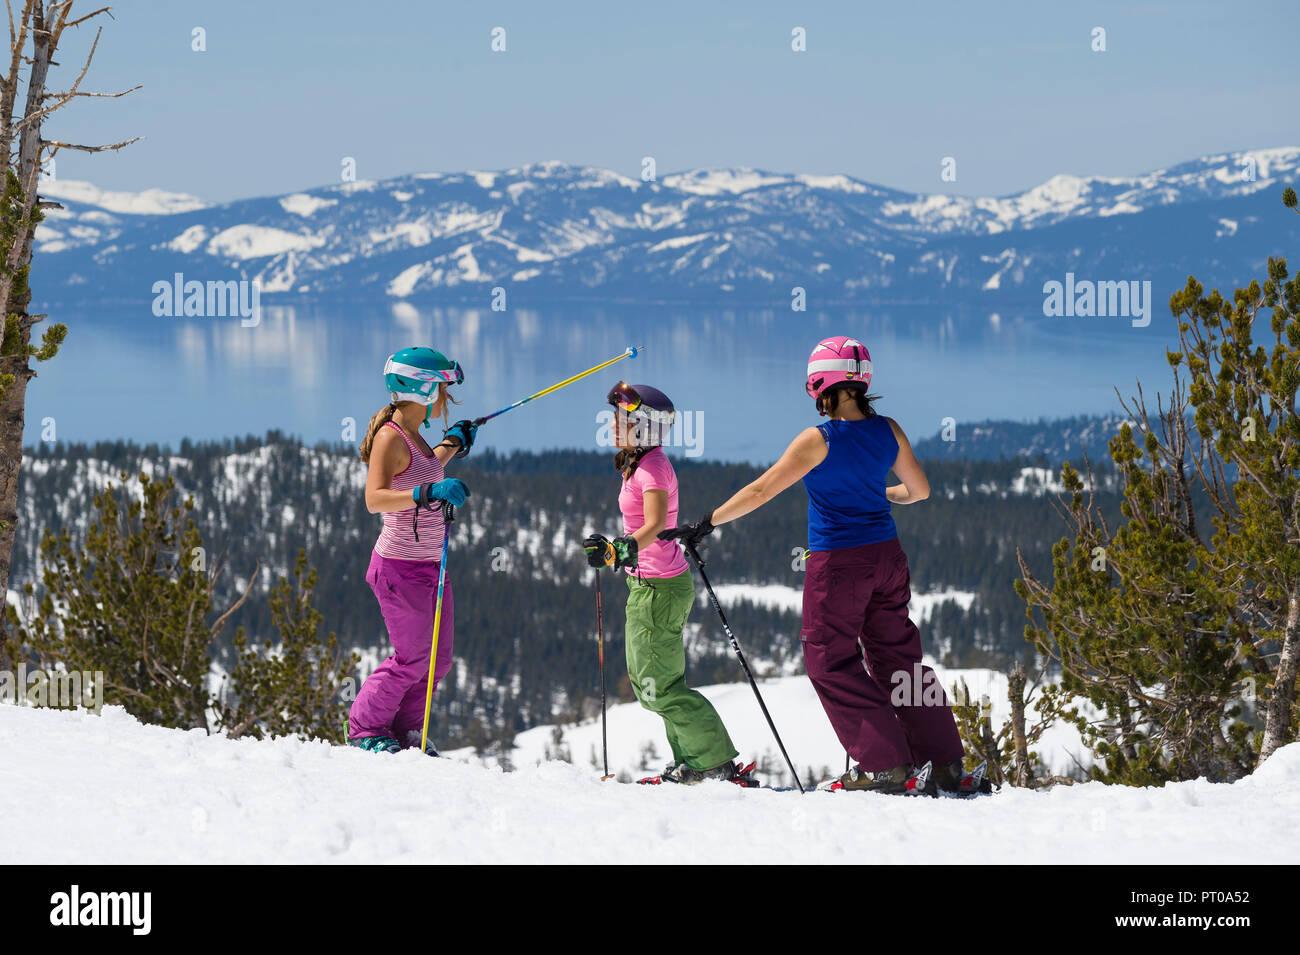 Spring Skiing at Mt. Rose Ski Tahoe, the closest Lake Tahoe ski area to Reno, Nevada. Stock Photo